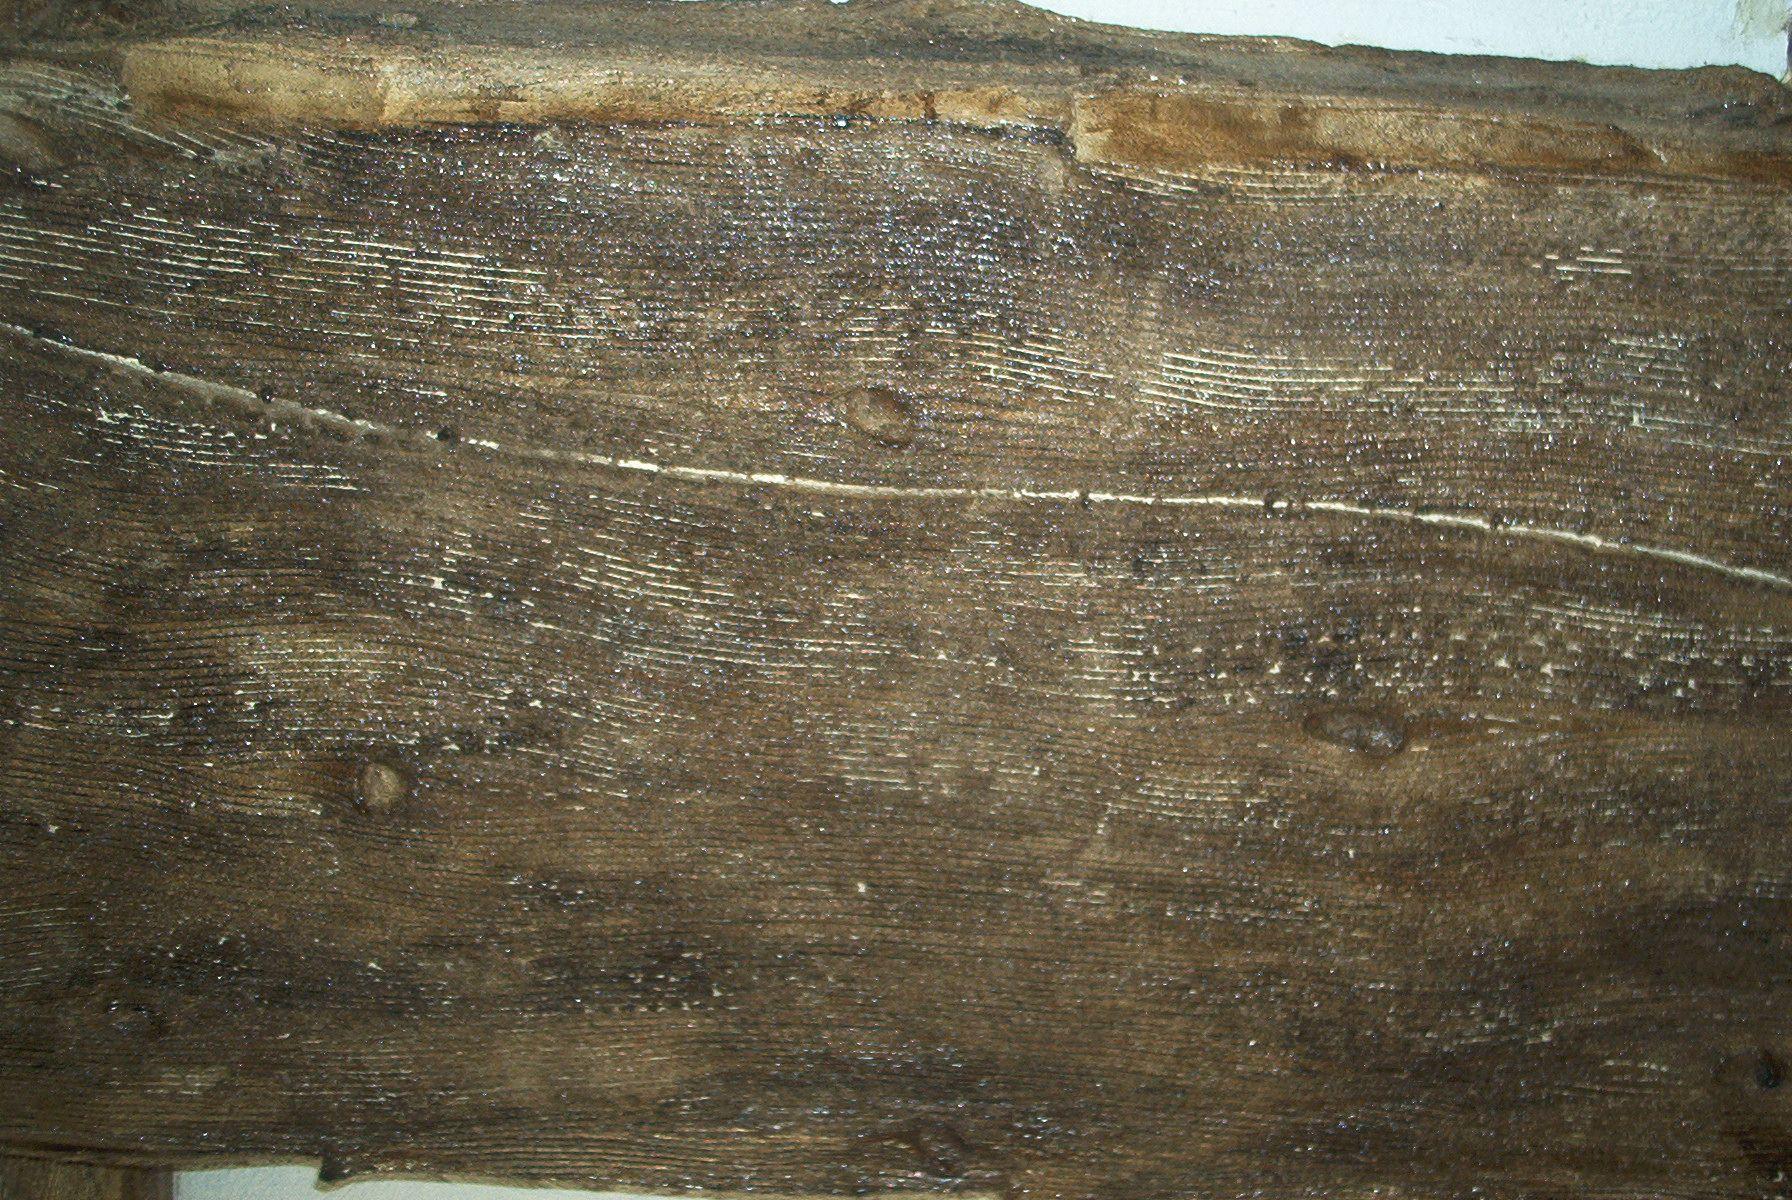 Detalle de falsa viga de madera